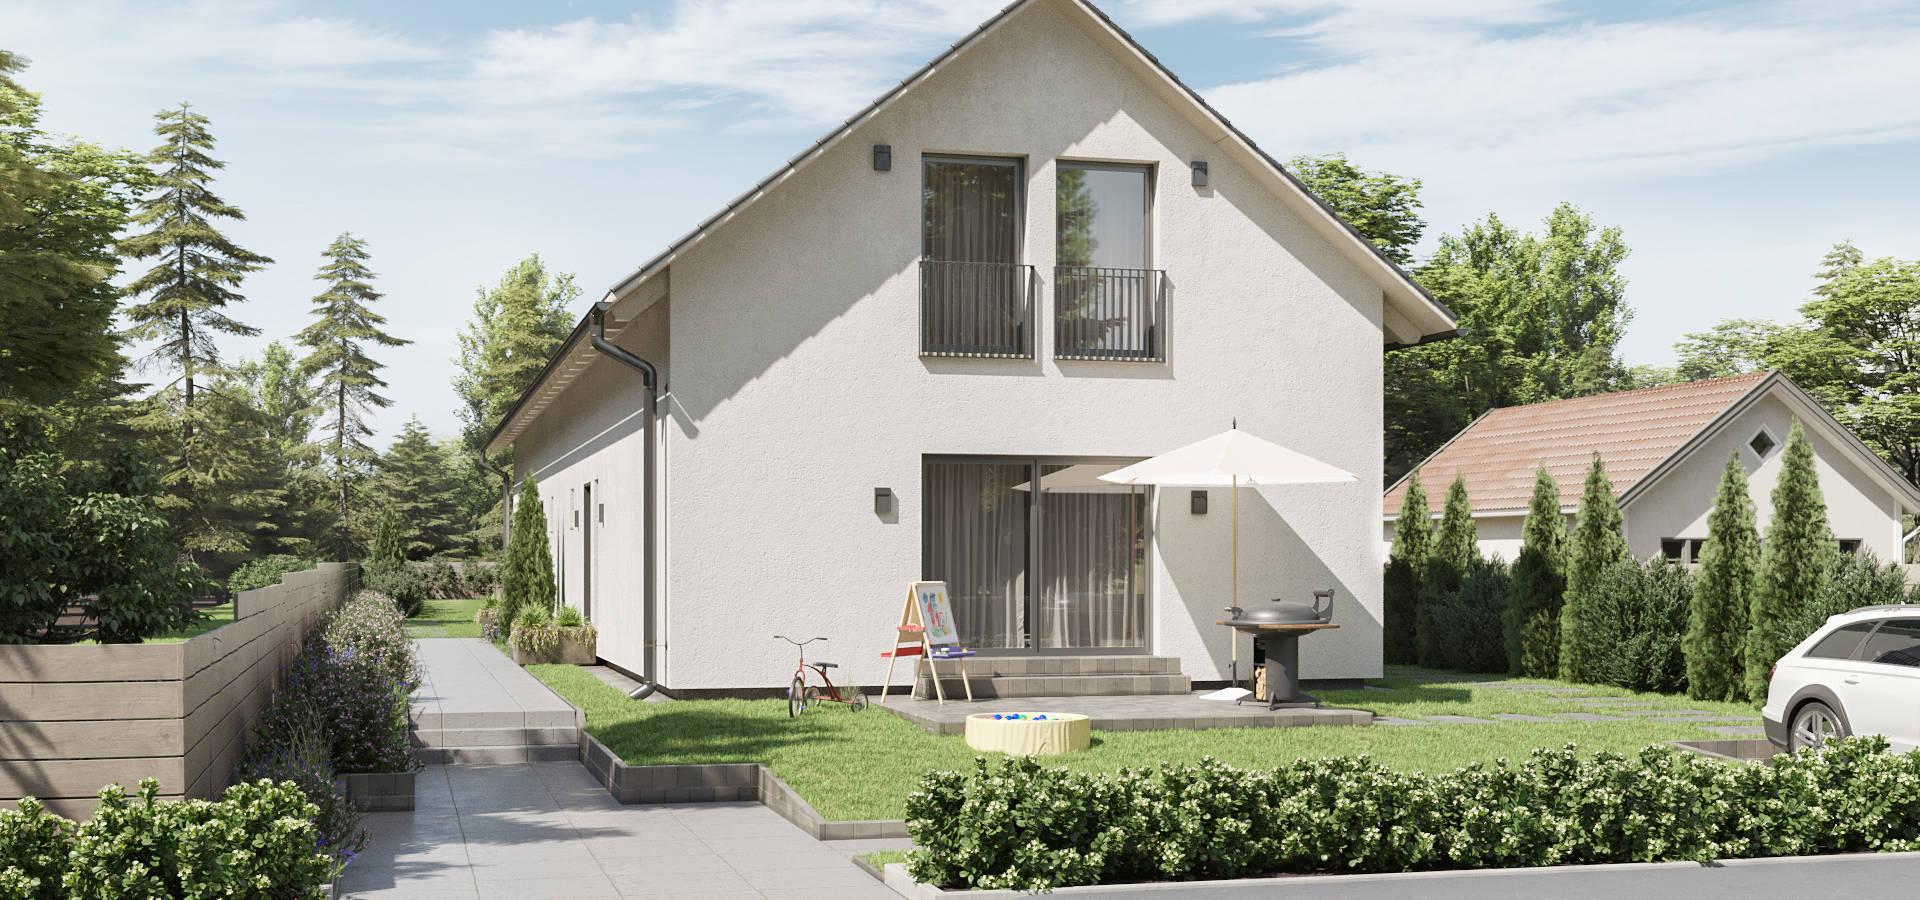 3W IMAGE GmbH